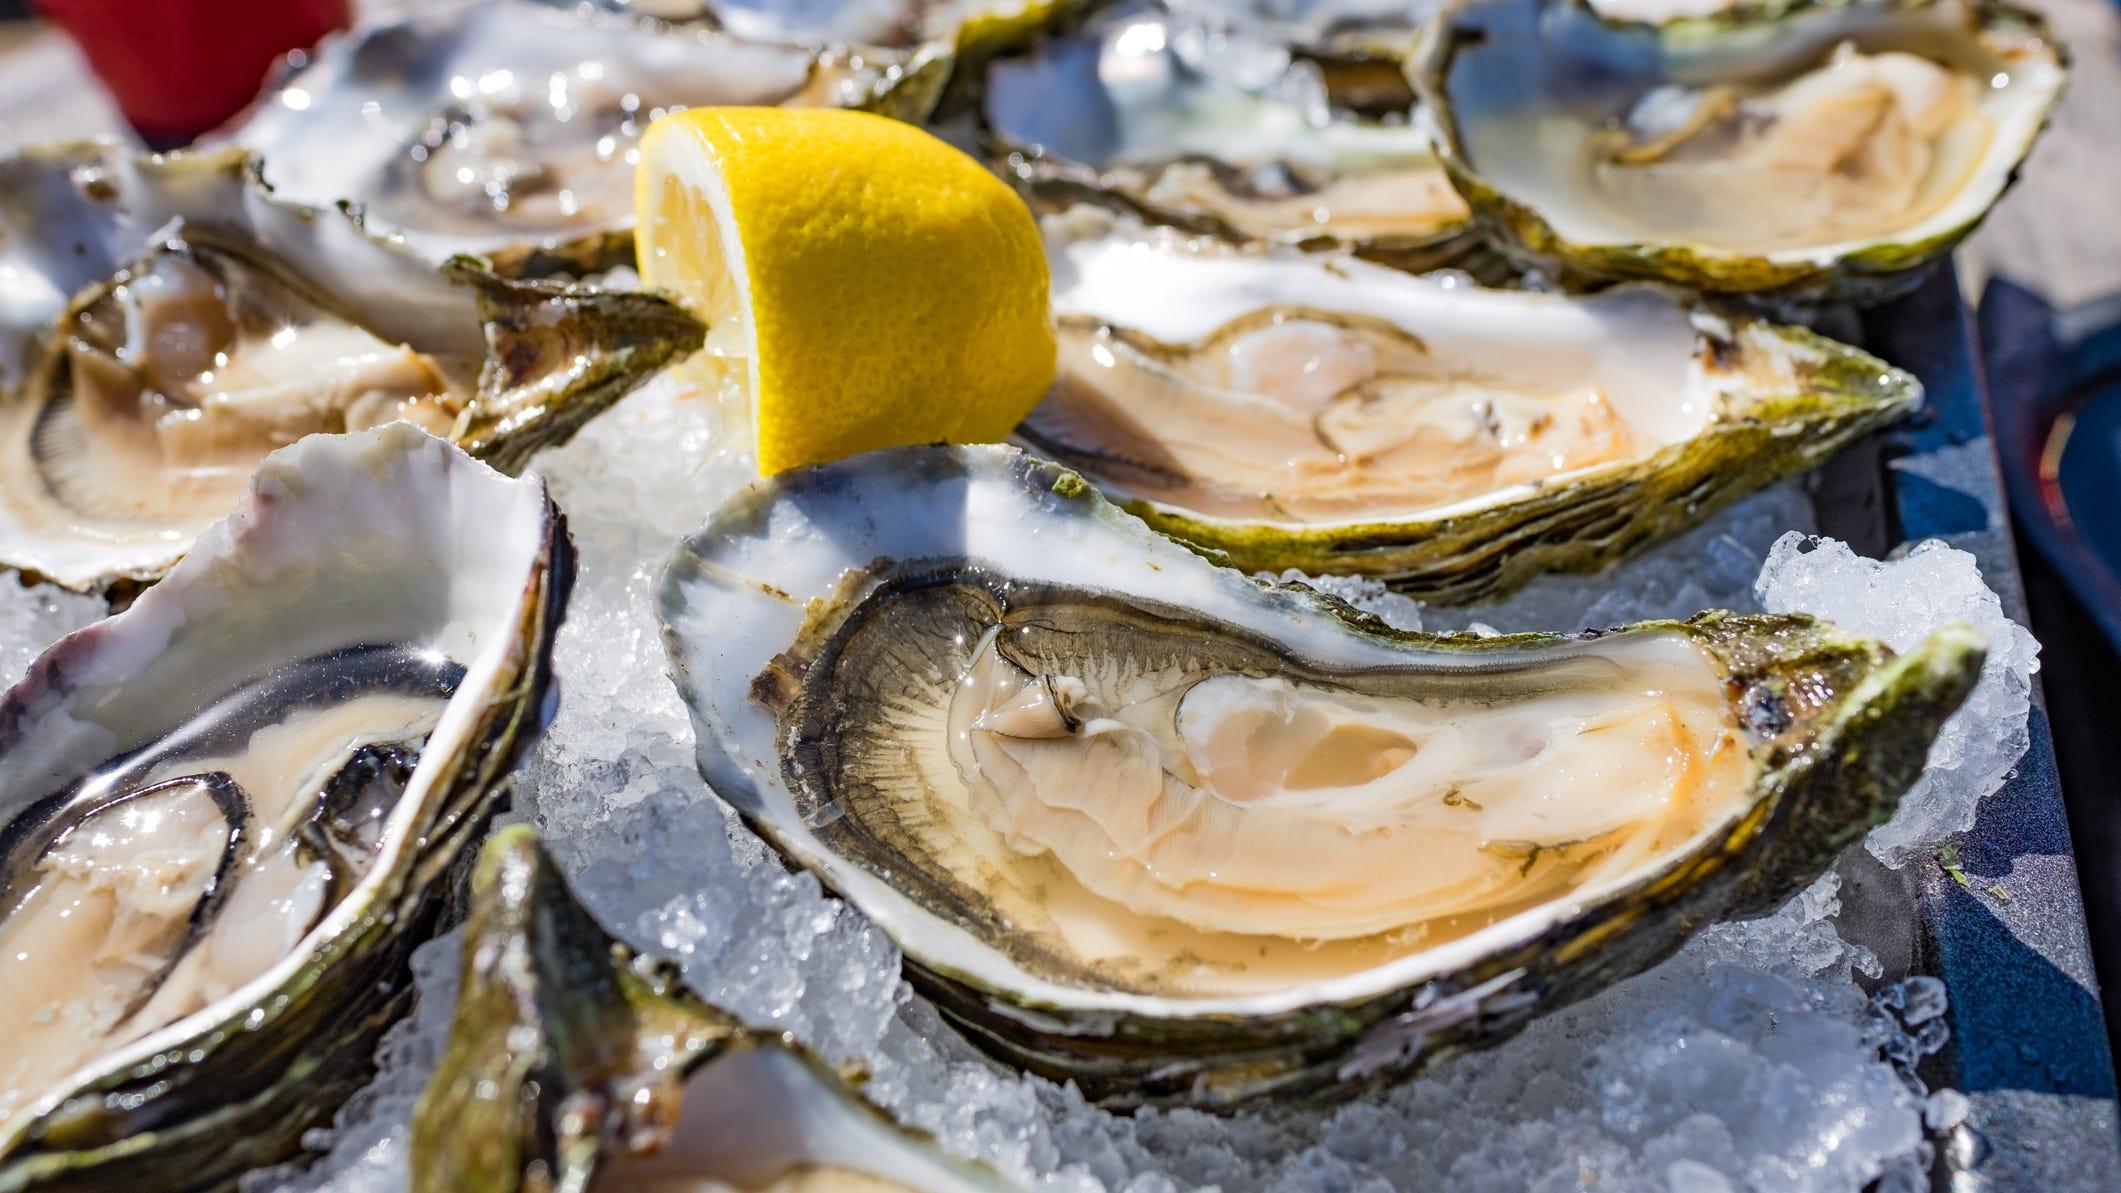 Multi-billion dollar Louisiana seafood industry still reeling from Hurricane Ida